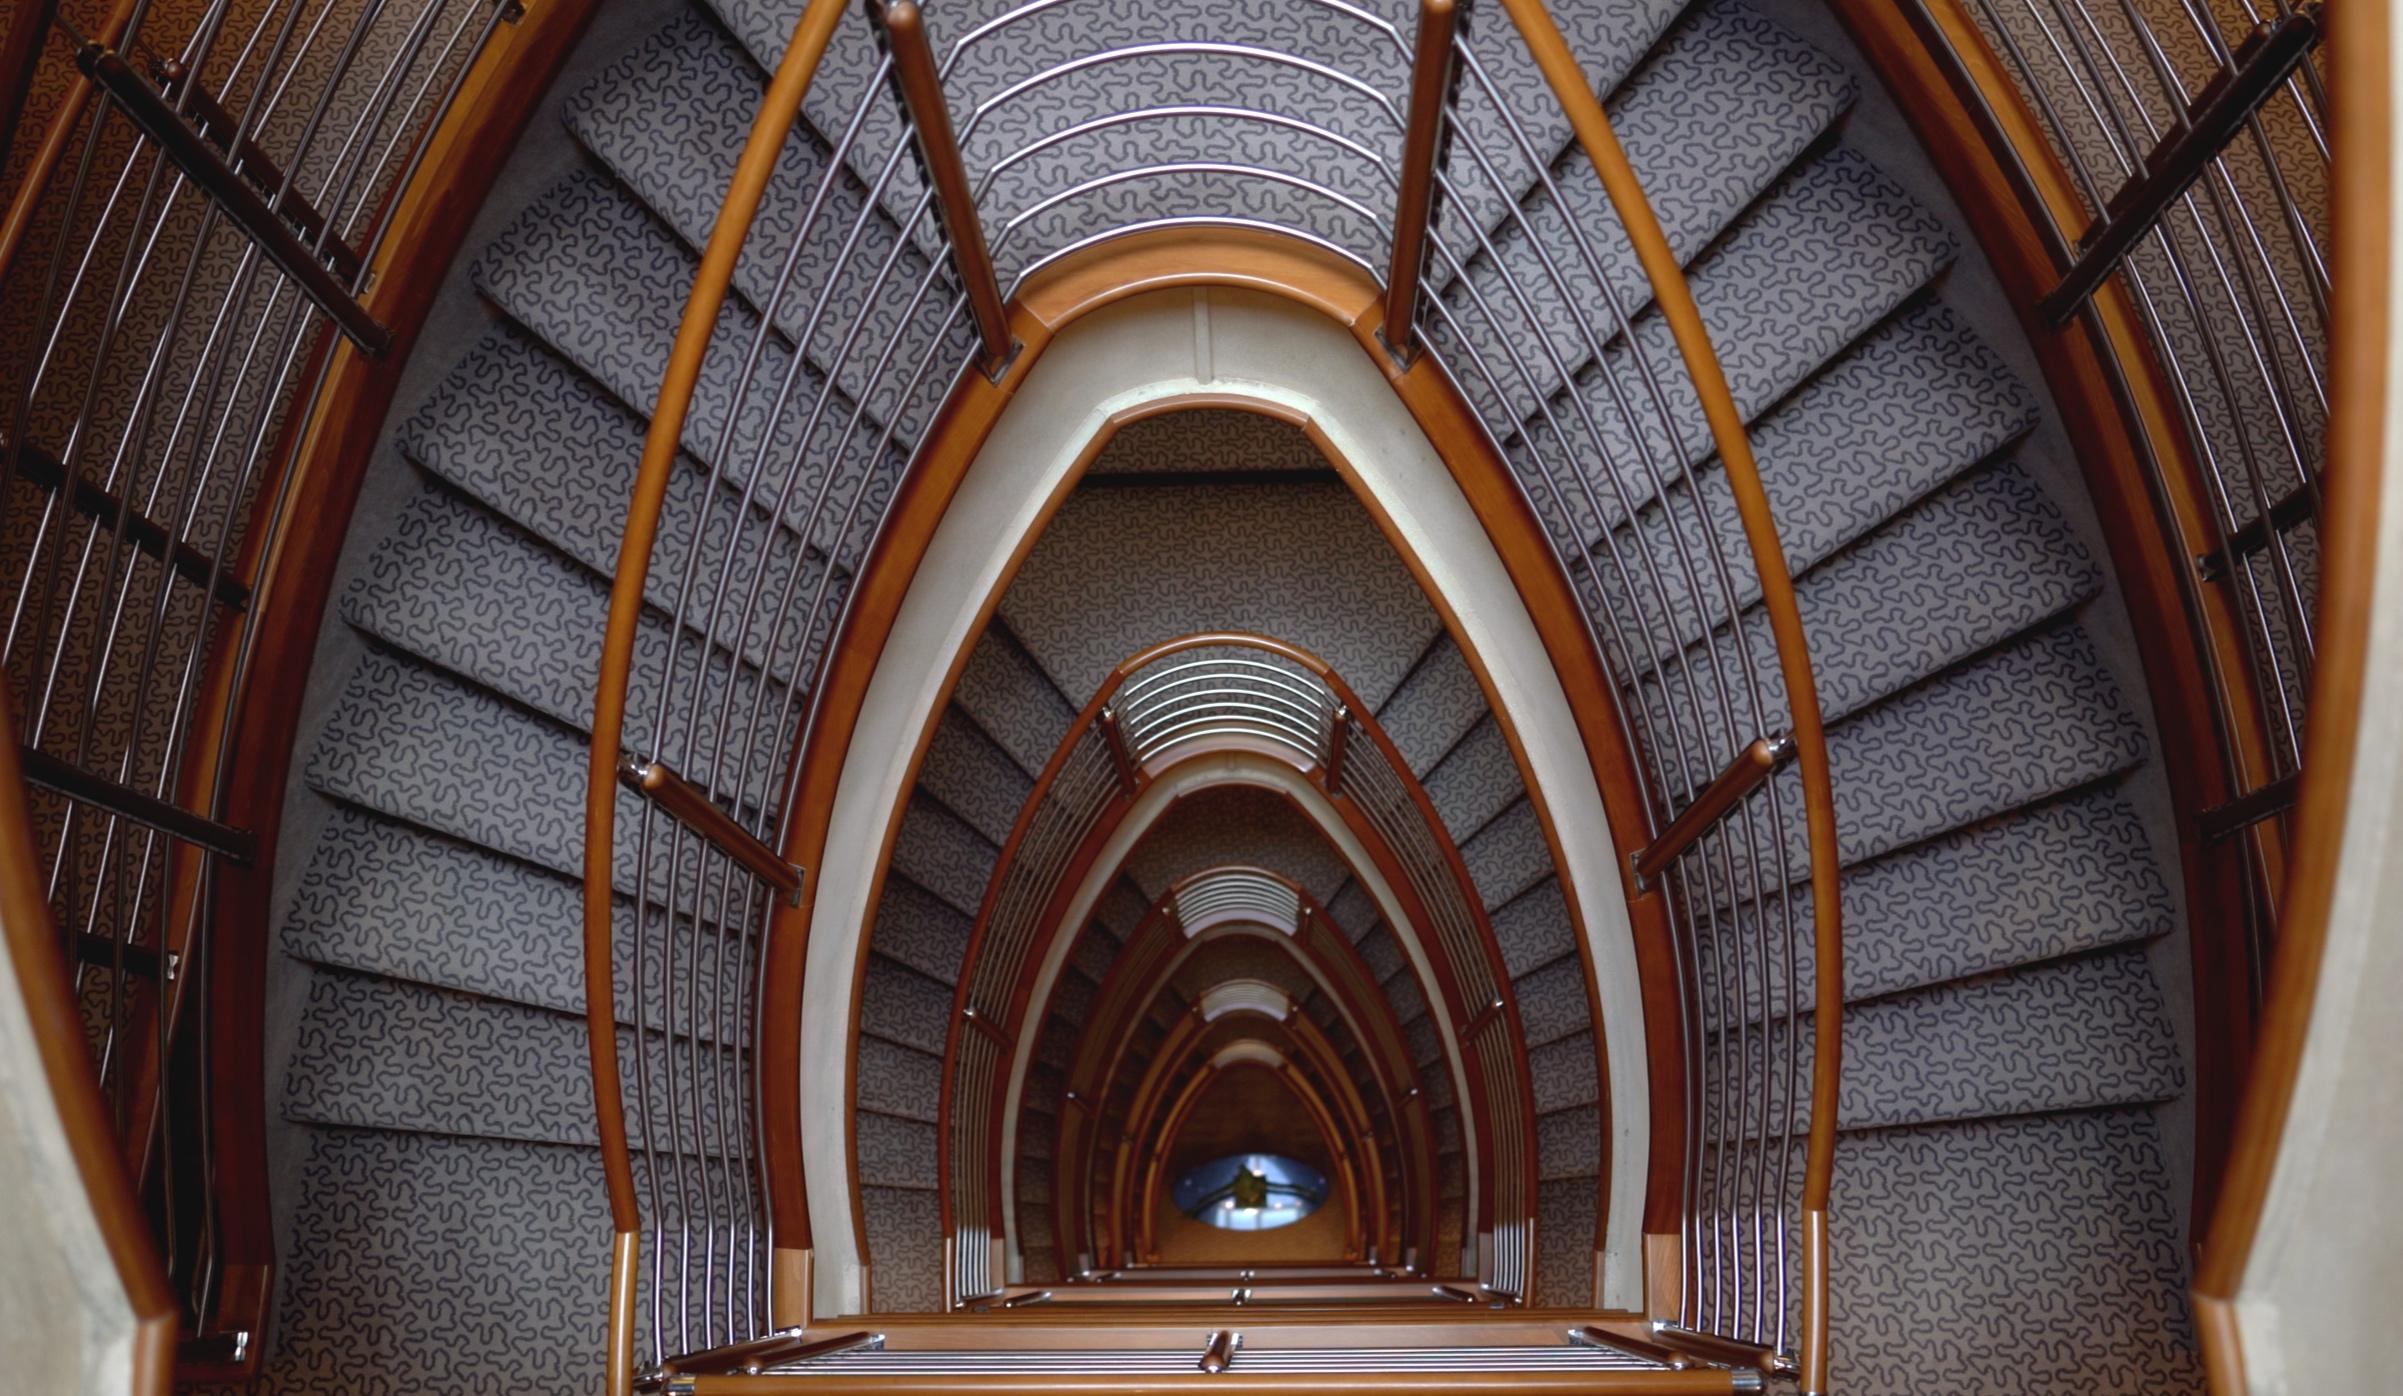 The main atrium staircase.